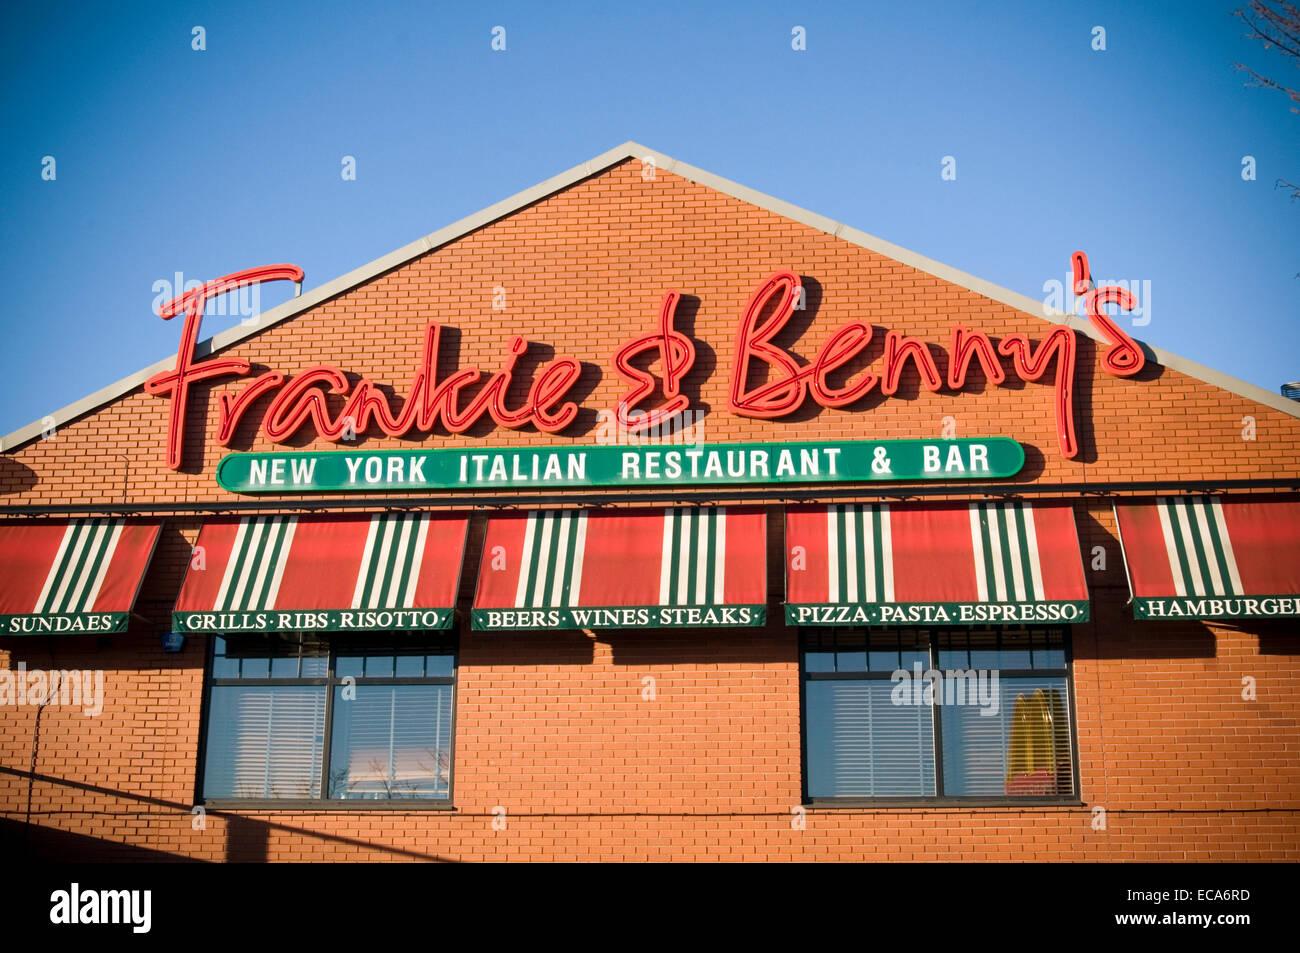 Frankie And Bennys Bennys Bennies Restaurant Restaurants Bar